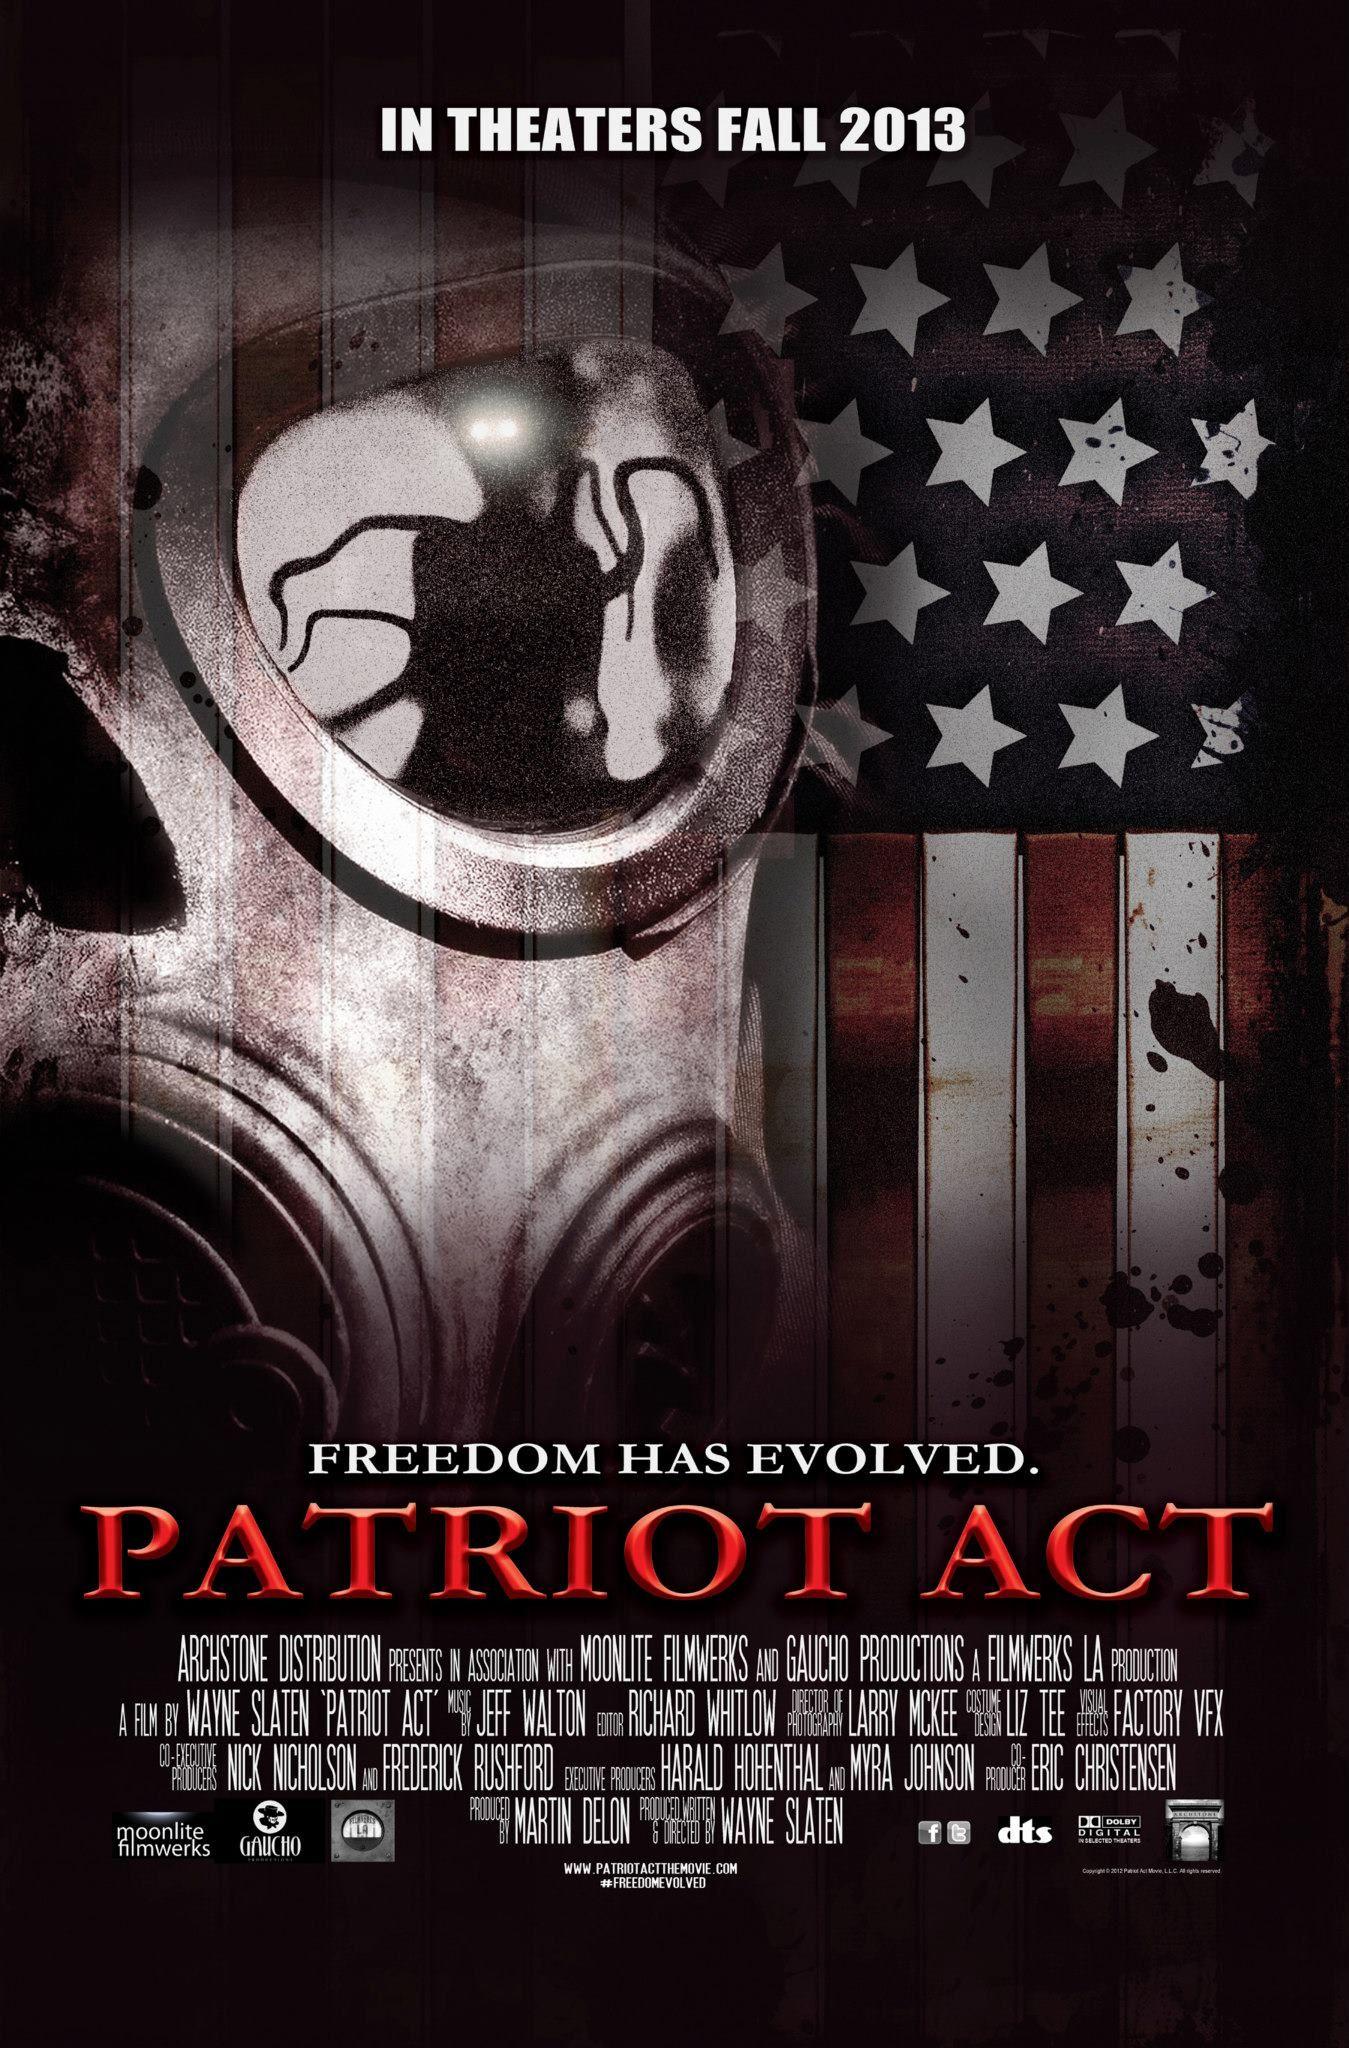 Patriot Act 2013 Movie Poster Movie Posters Internet Movies Top Movies